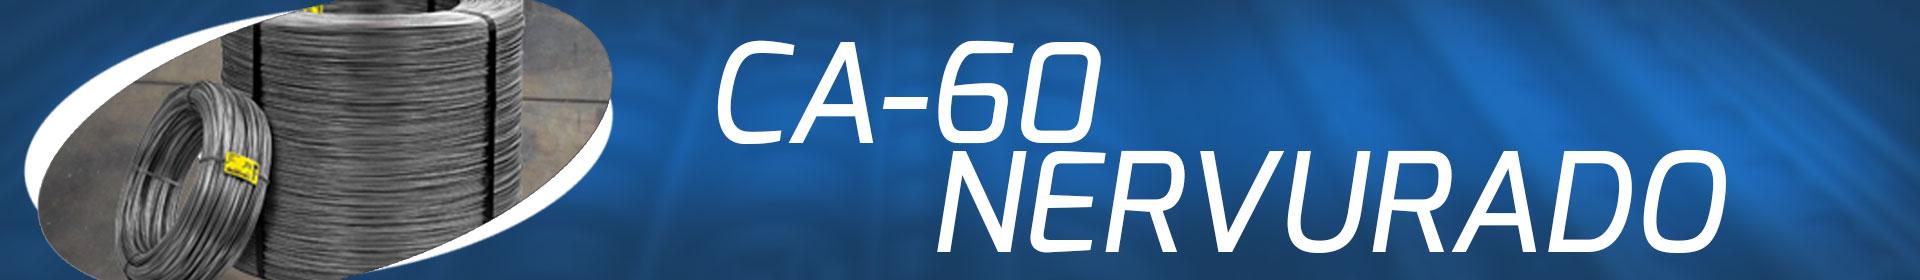 ca-60-nervurado-topo